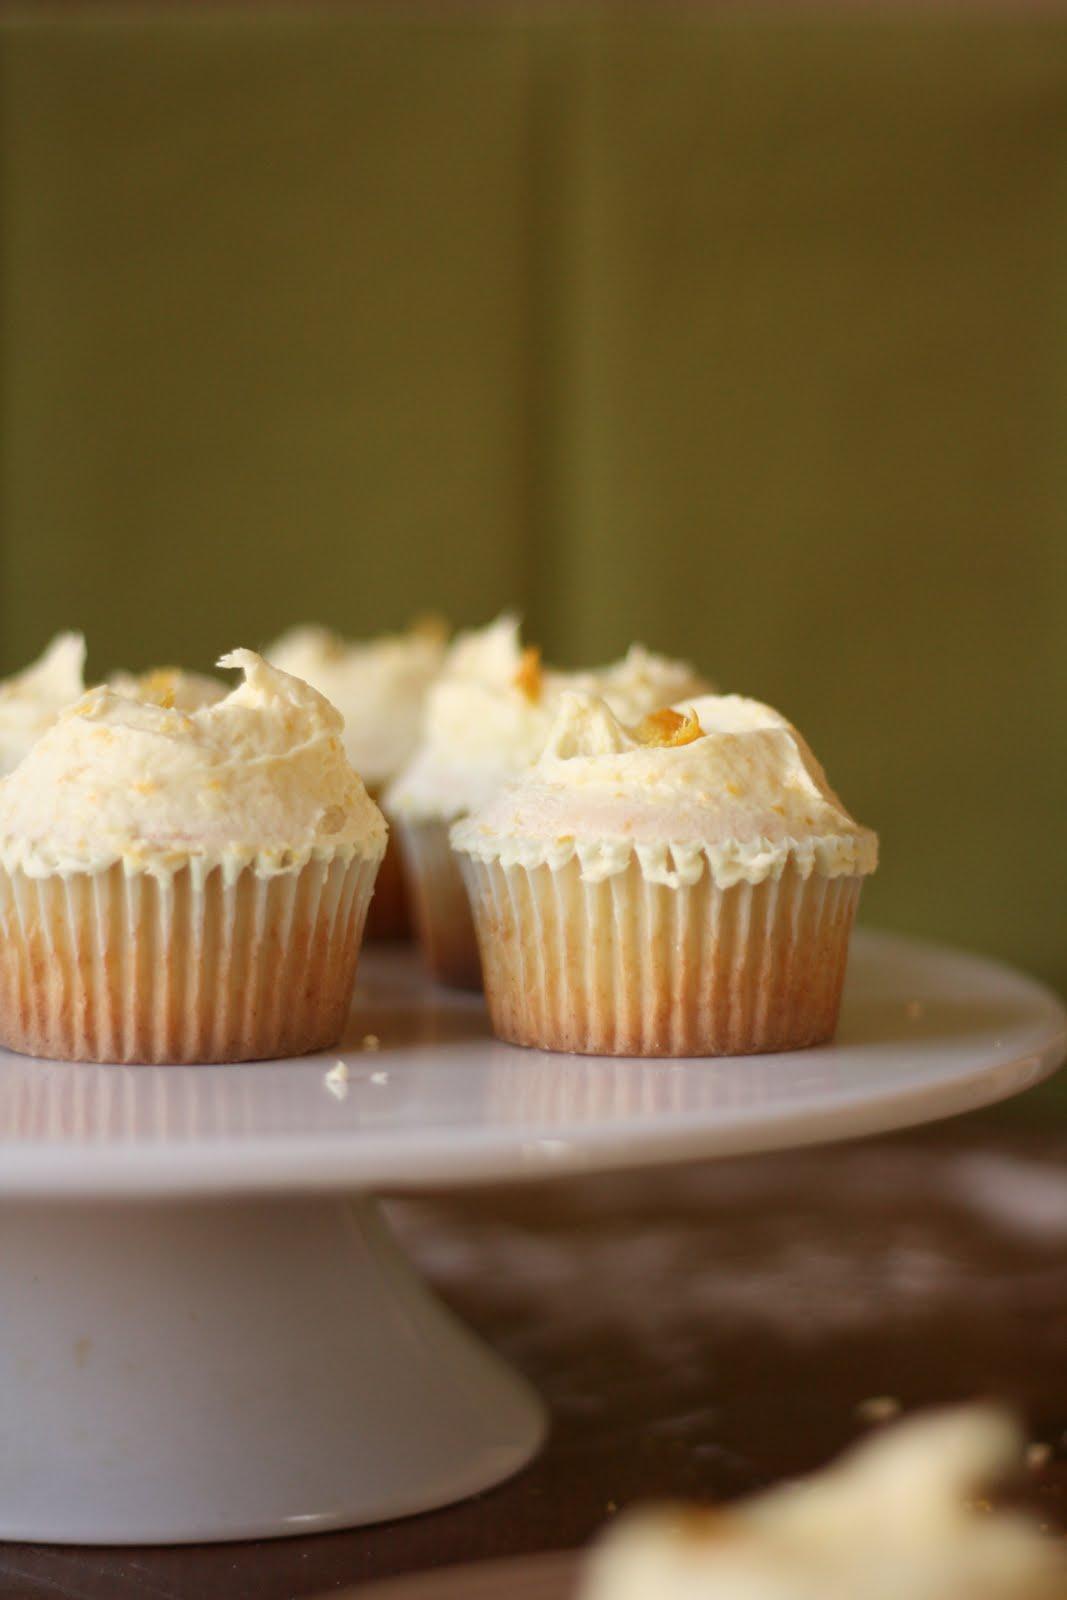 Hummingbird Bakery Lemon Cupcakes Recipe (Adapted for High-Altitude ...